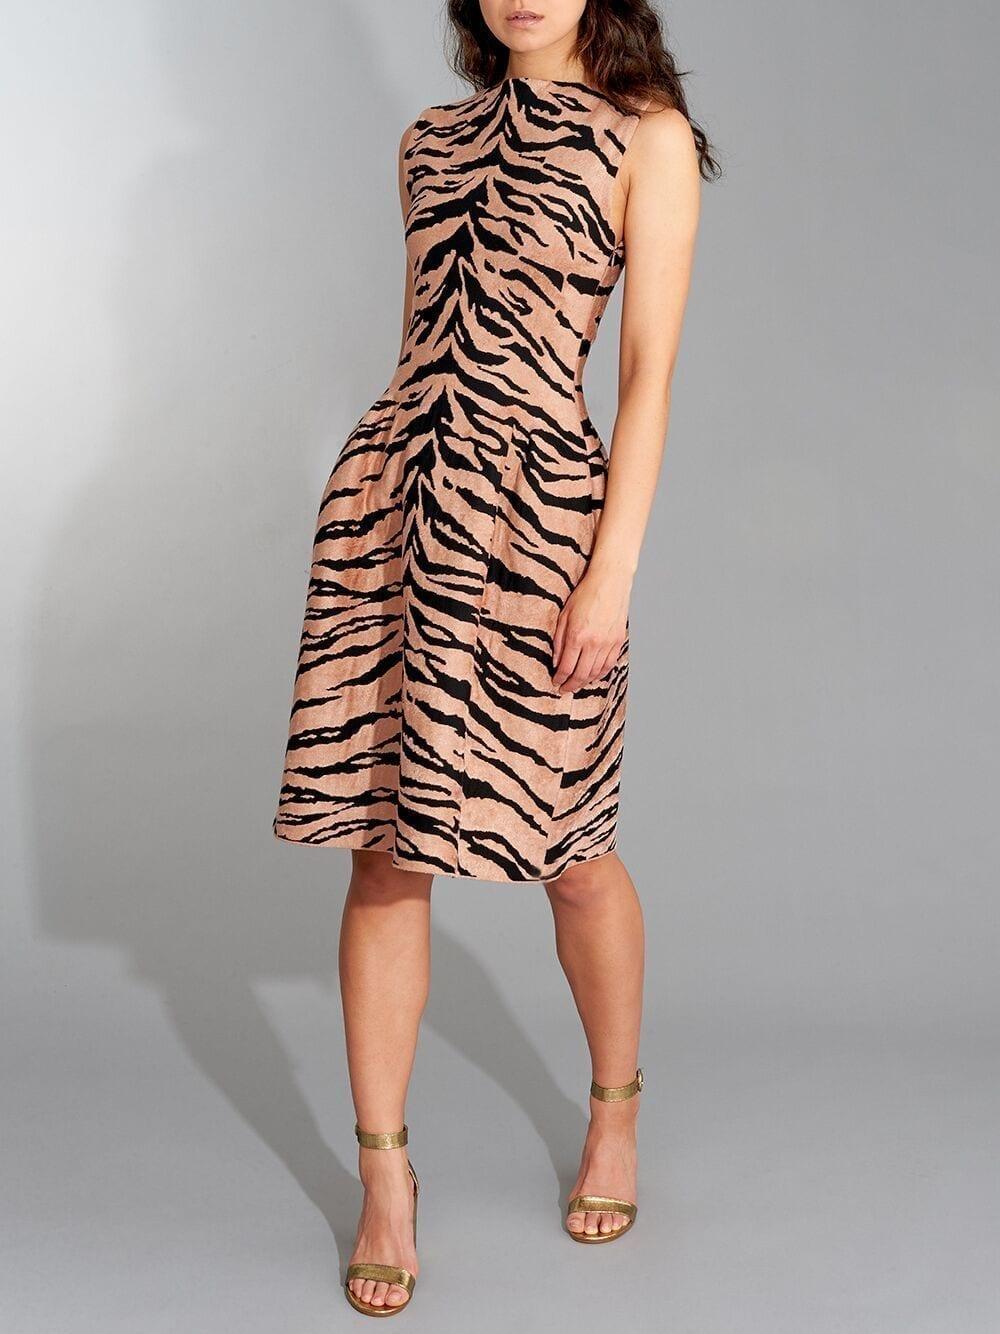 AZZEDINE ALAÏA Sleeveless Boat Neck Zebra A-Line Dress